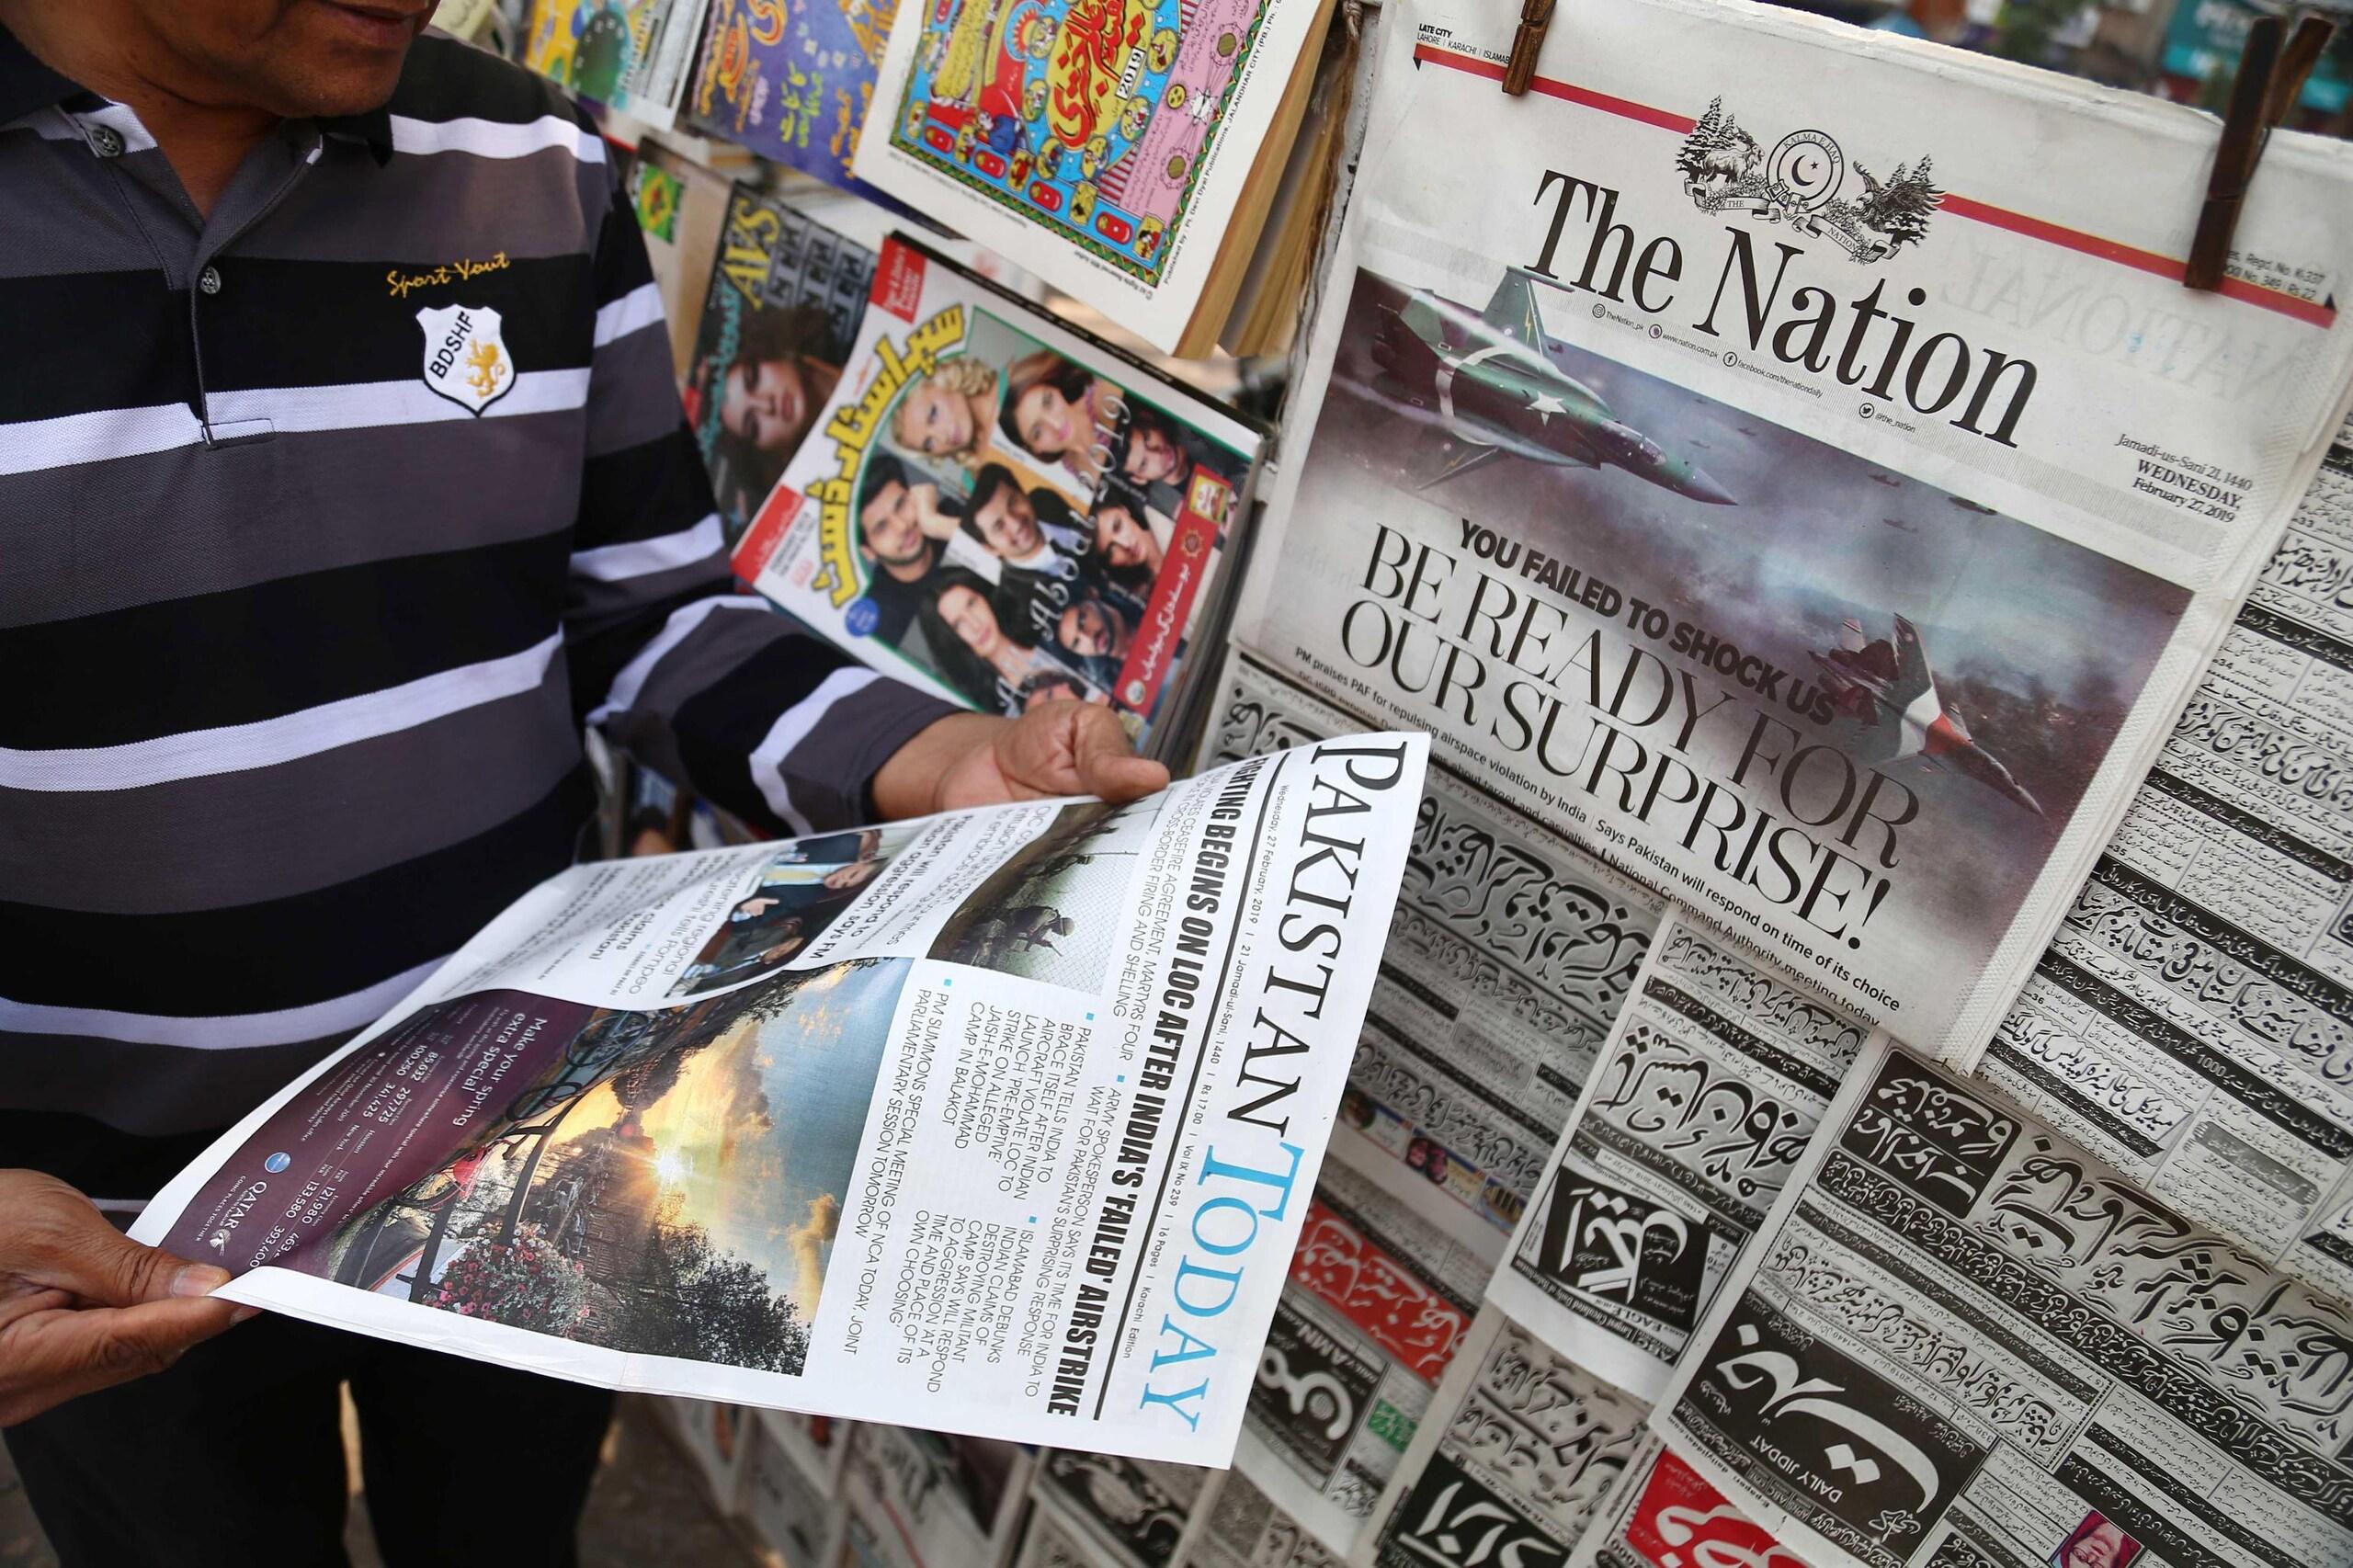 Kashmir:presi piloti jet India abbattuti